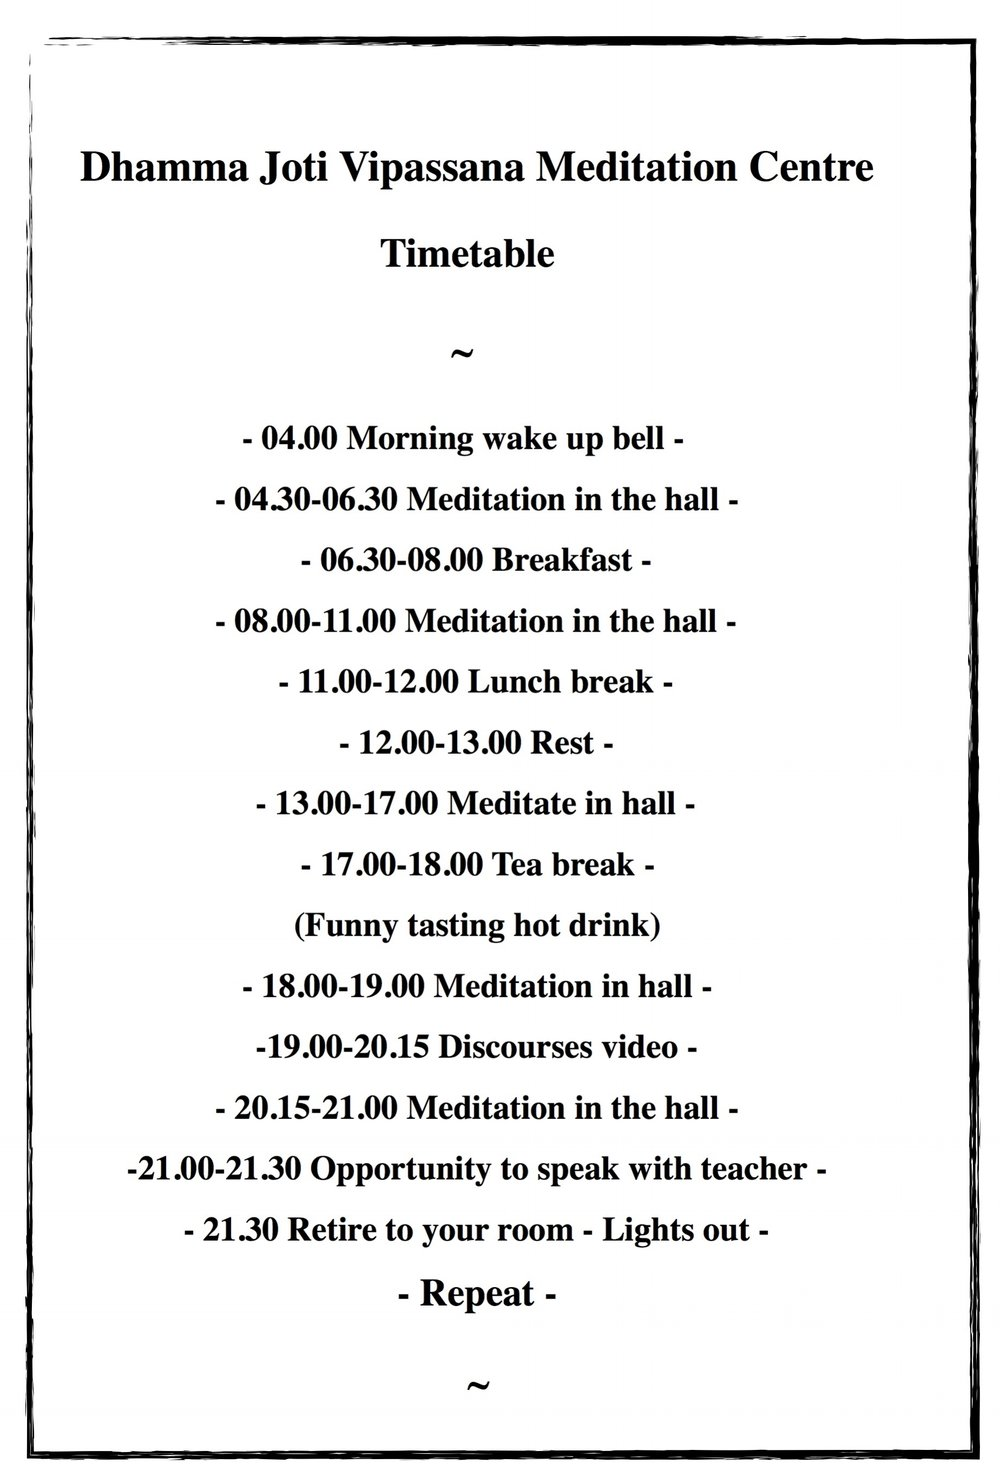 dhamma joti timetable.jpg